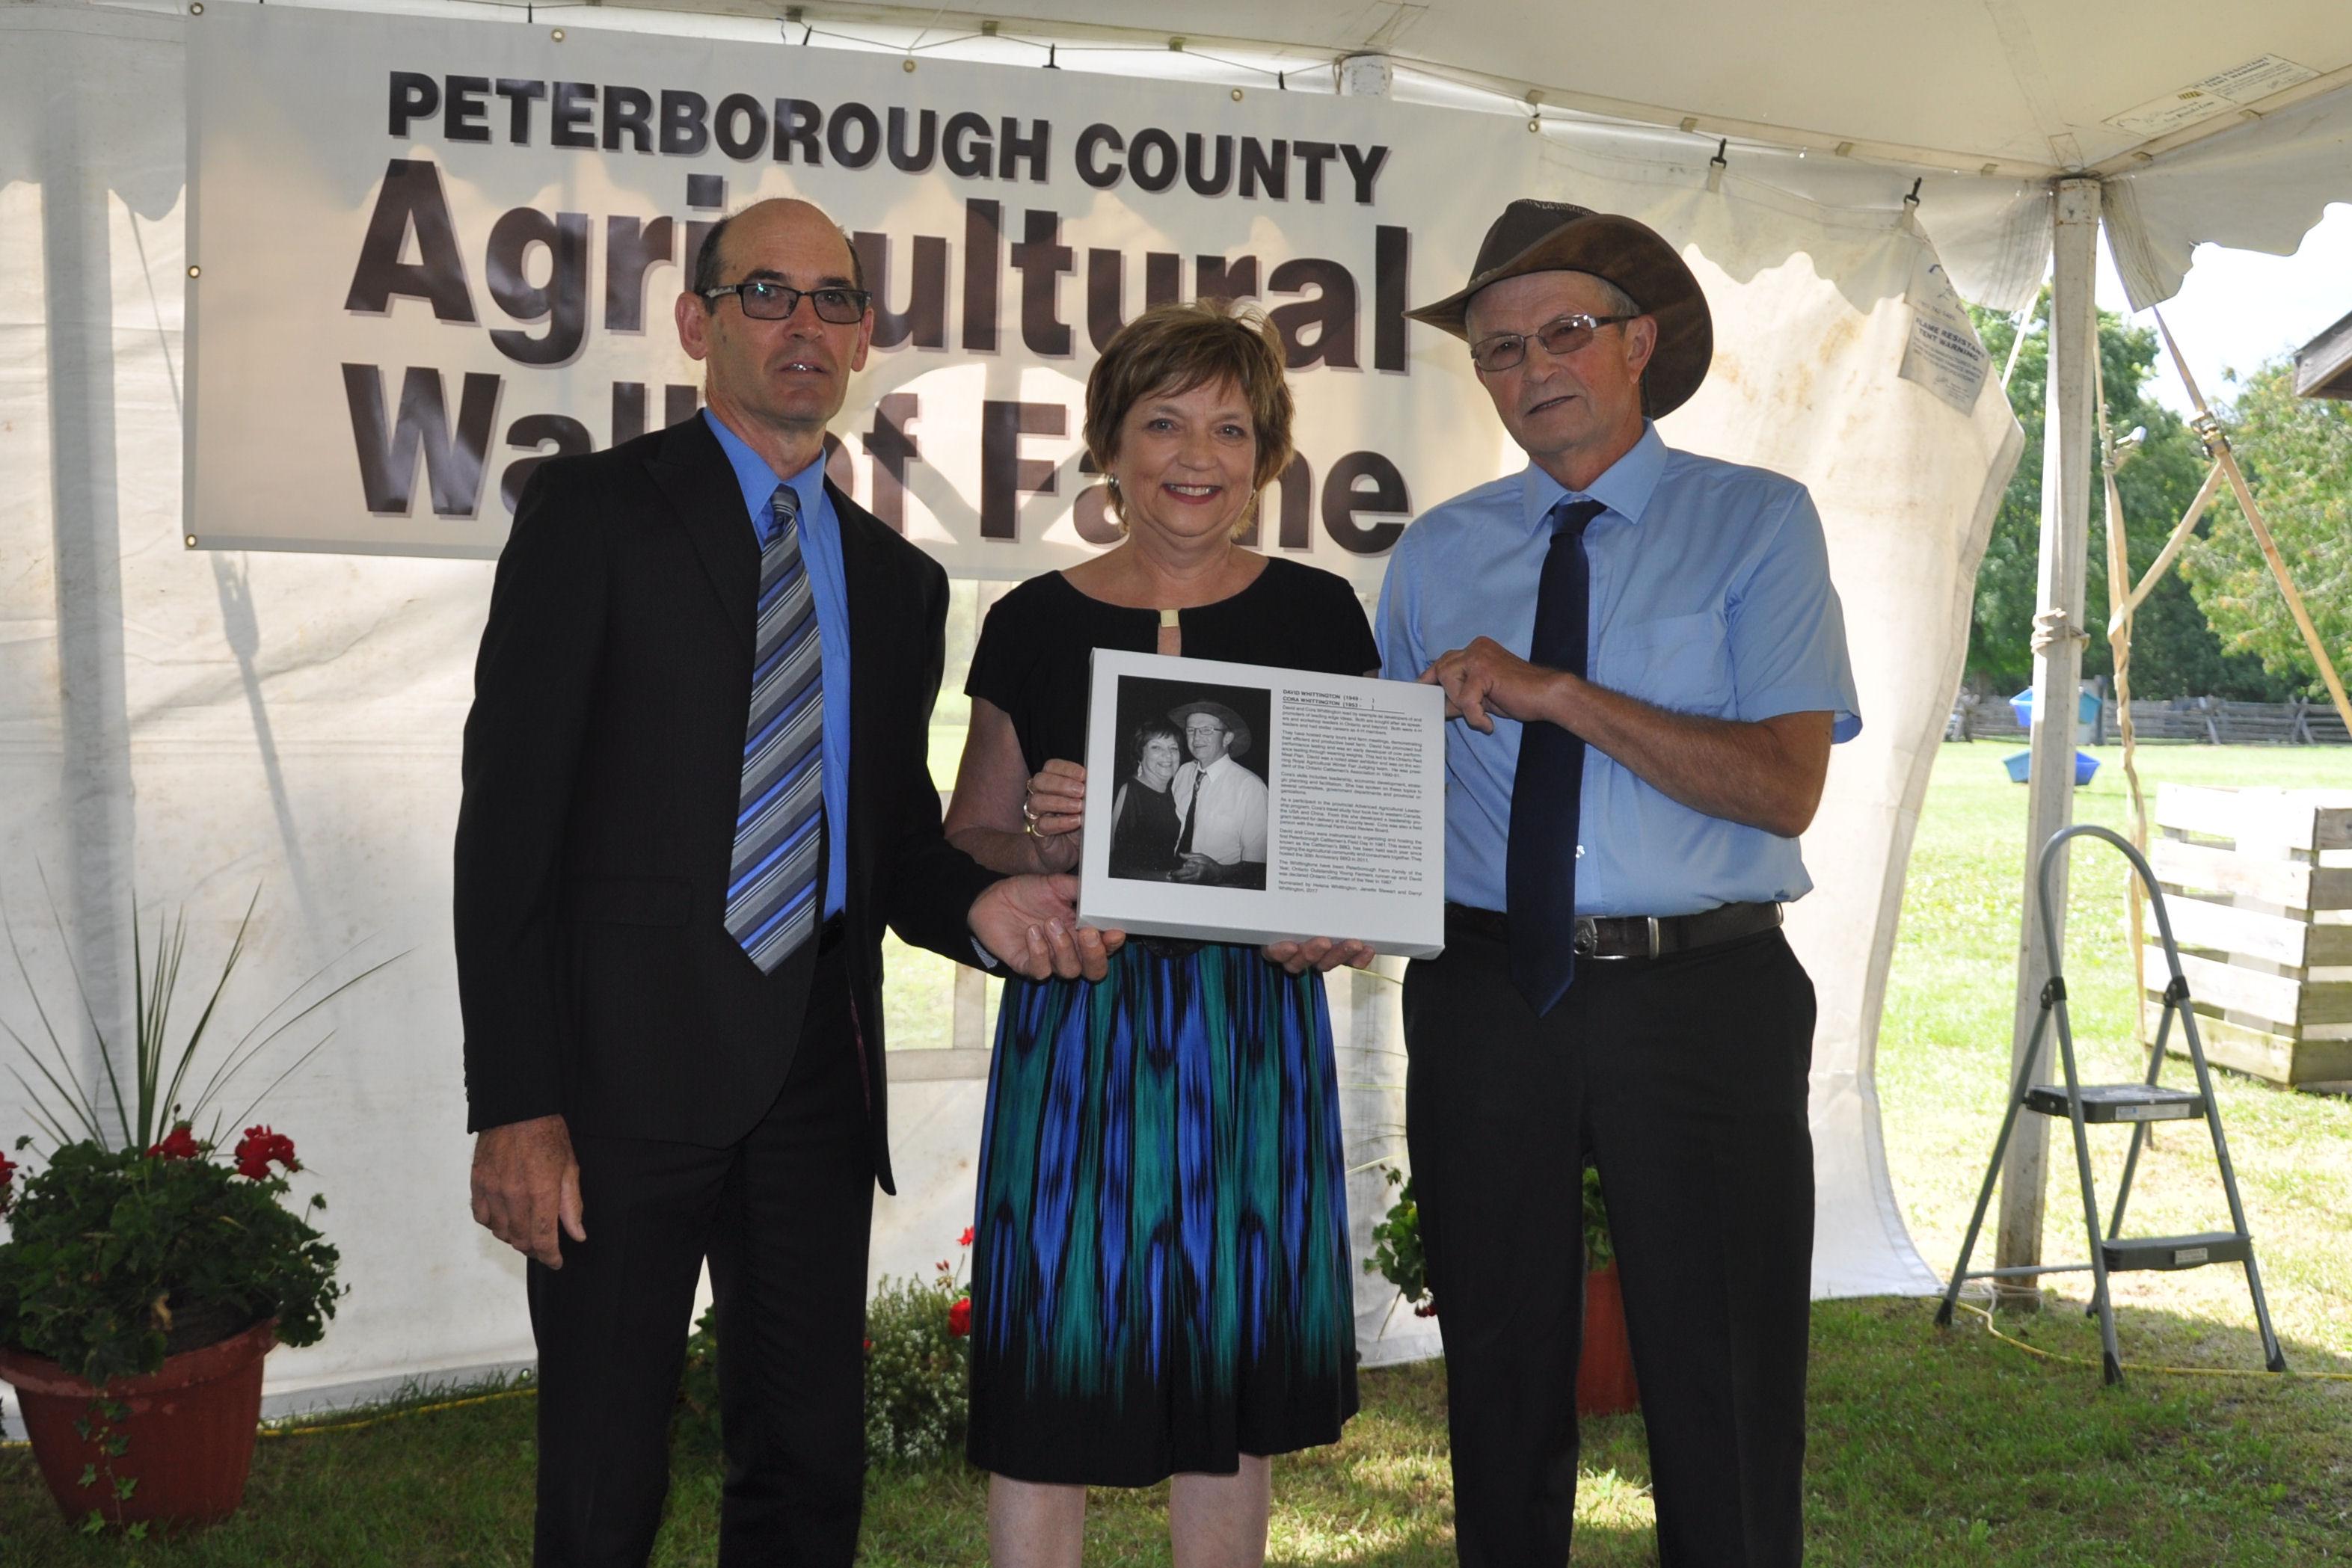 Wayne Warner, Cora and David Whittington